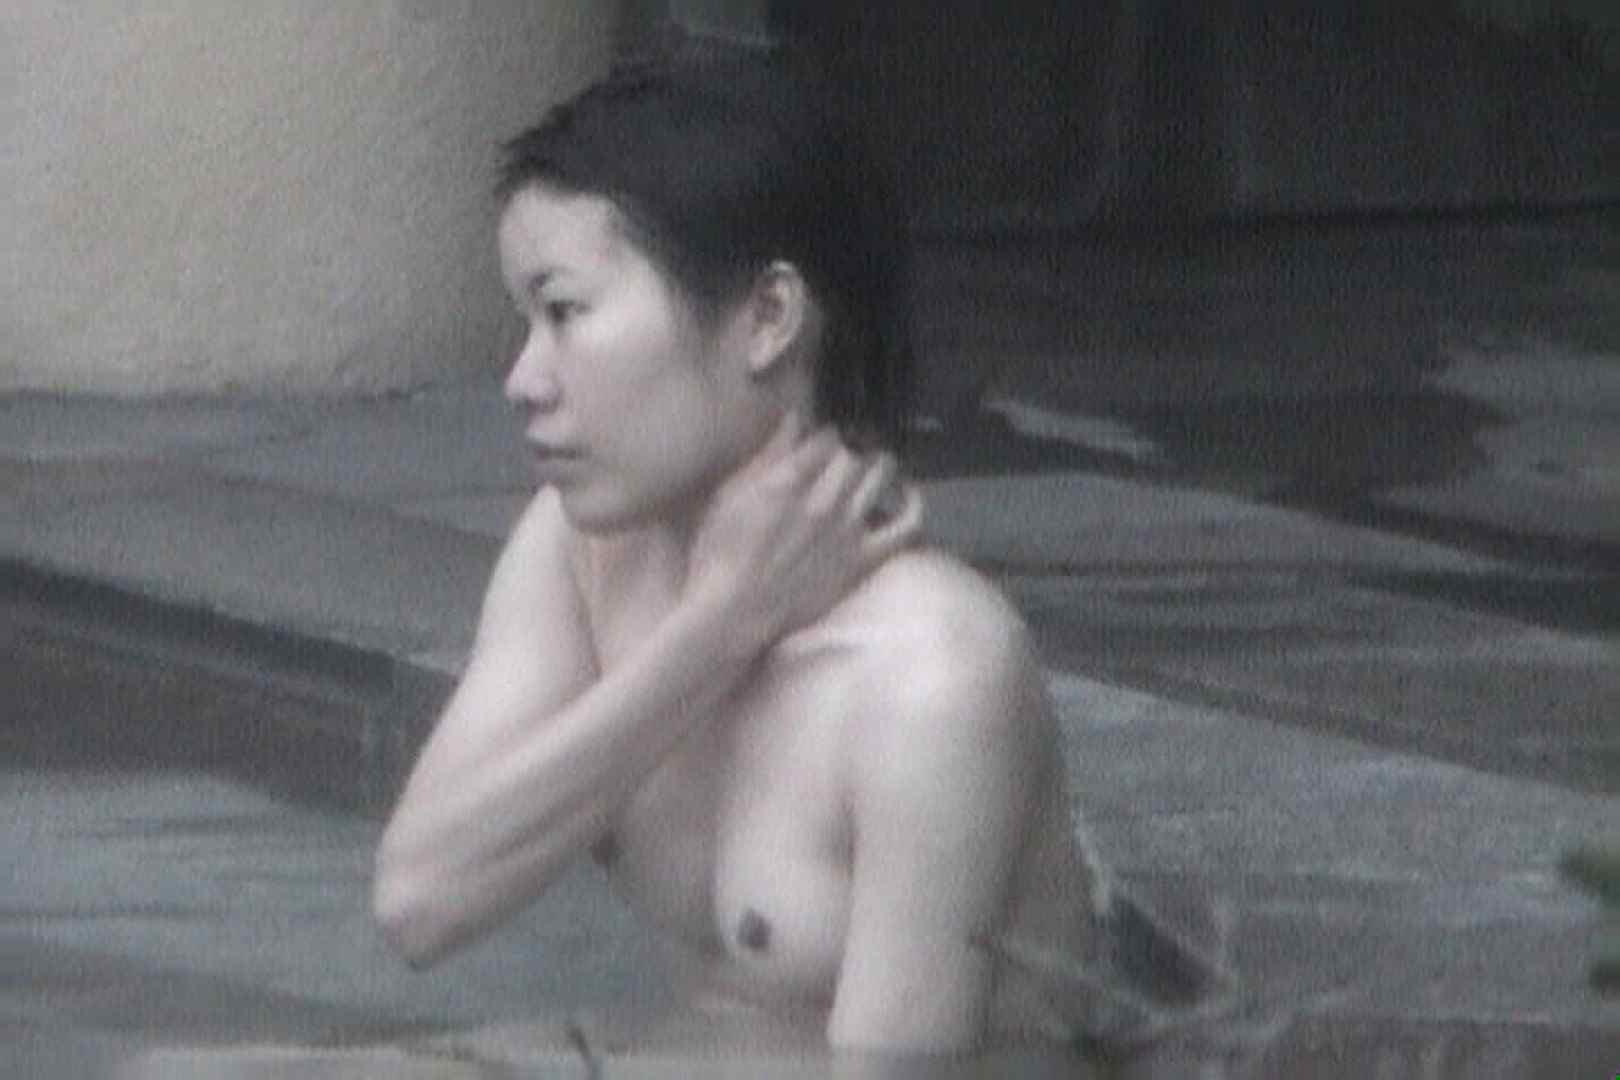 Aquaな露天風呂Vol.556 露天風呂編  99PIX 72